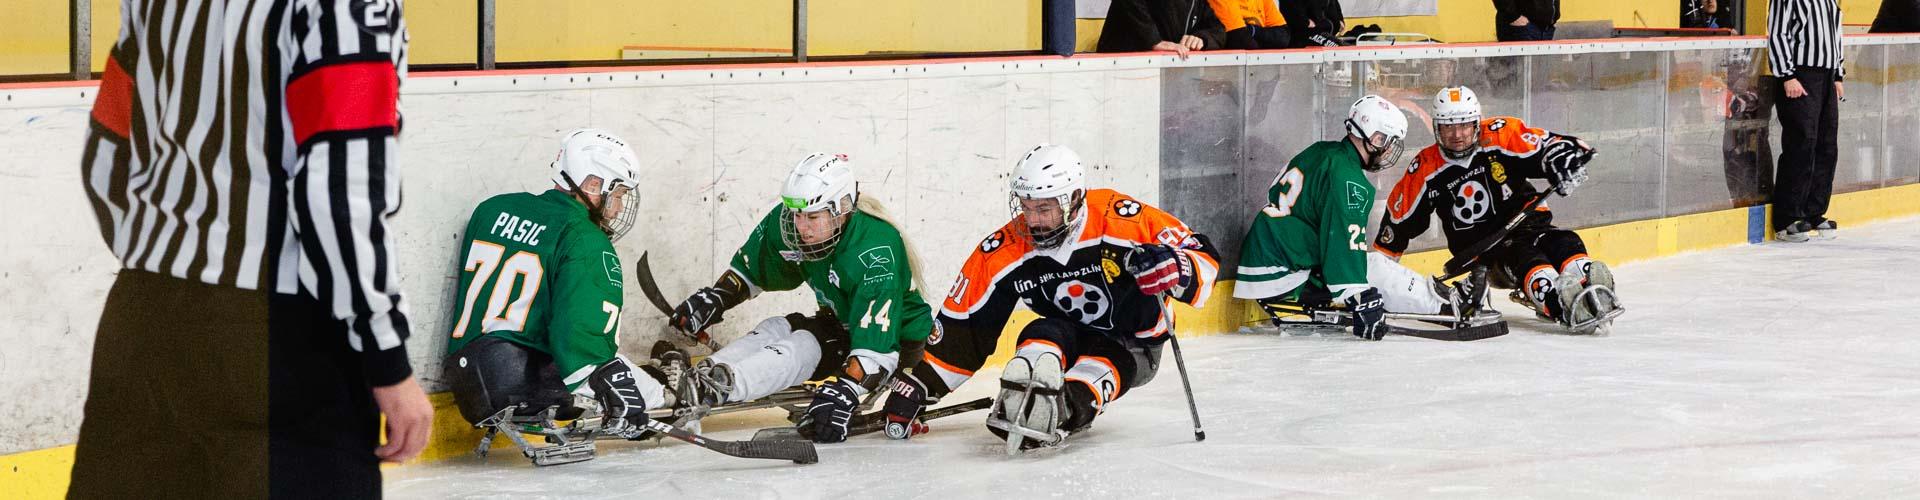 Sledge hokejisté na ledě.